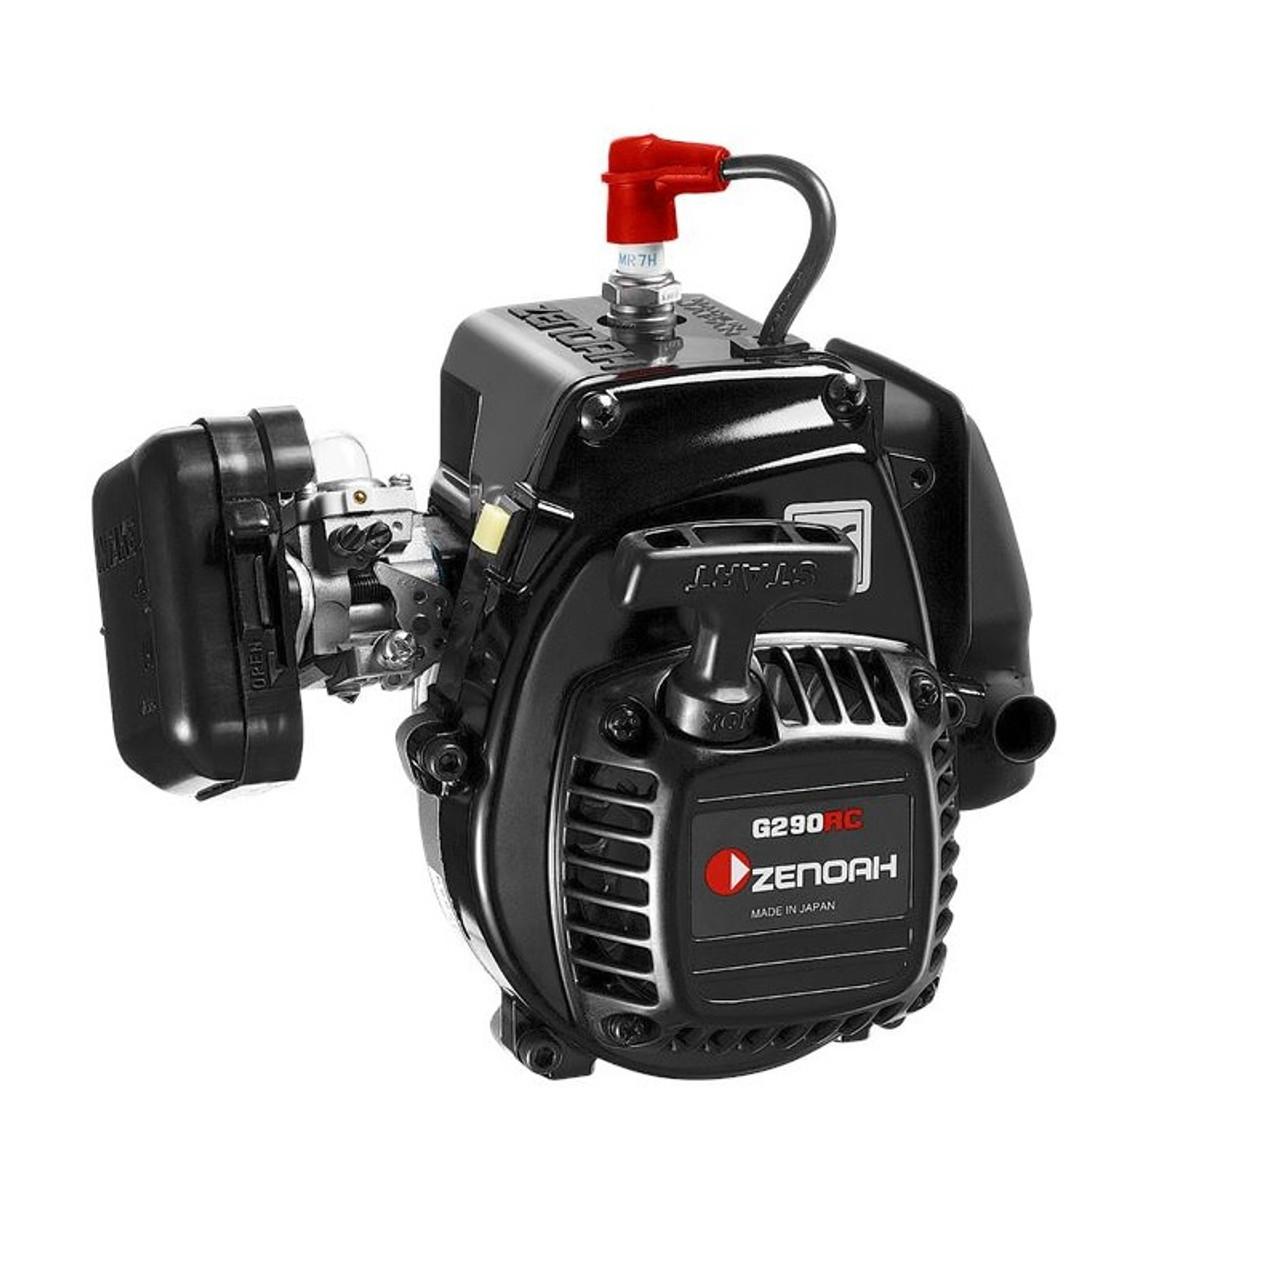 Zenoah G290RC Engine +1mm Installed (29 5cc)